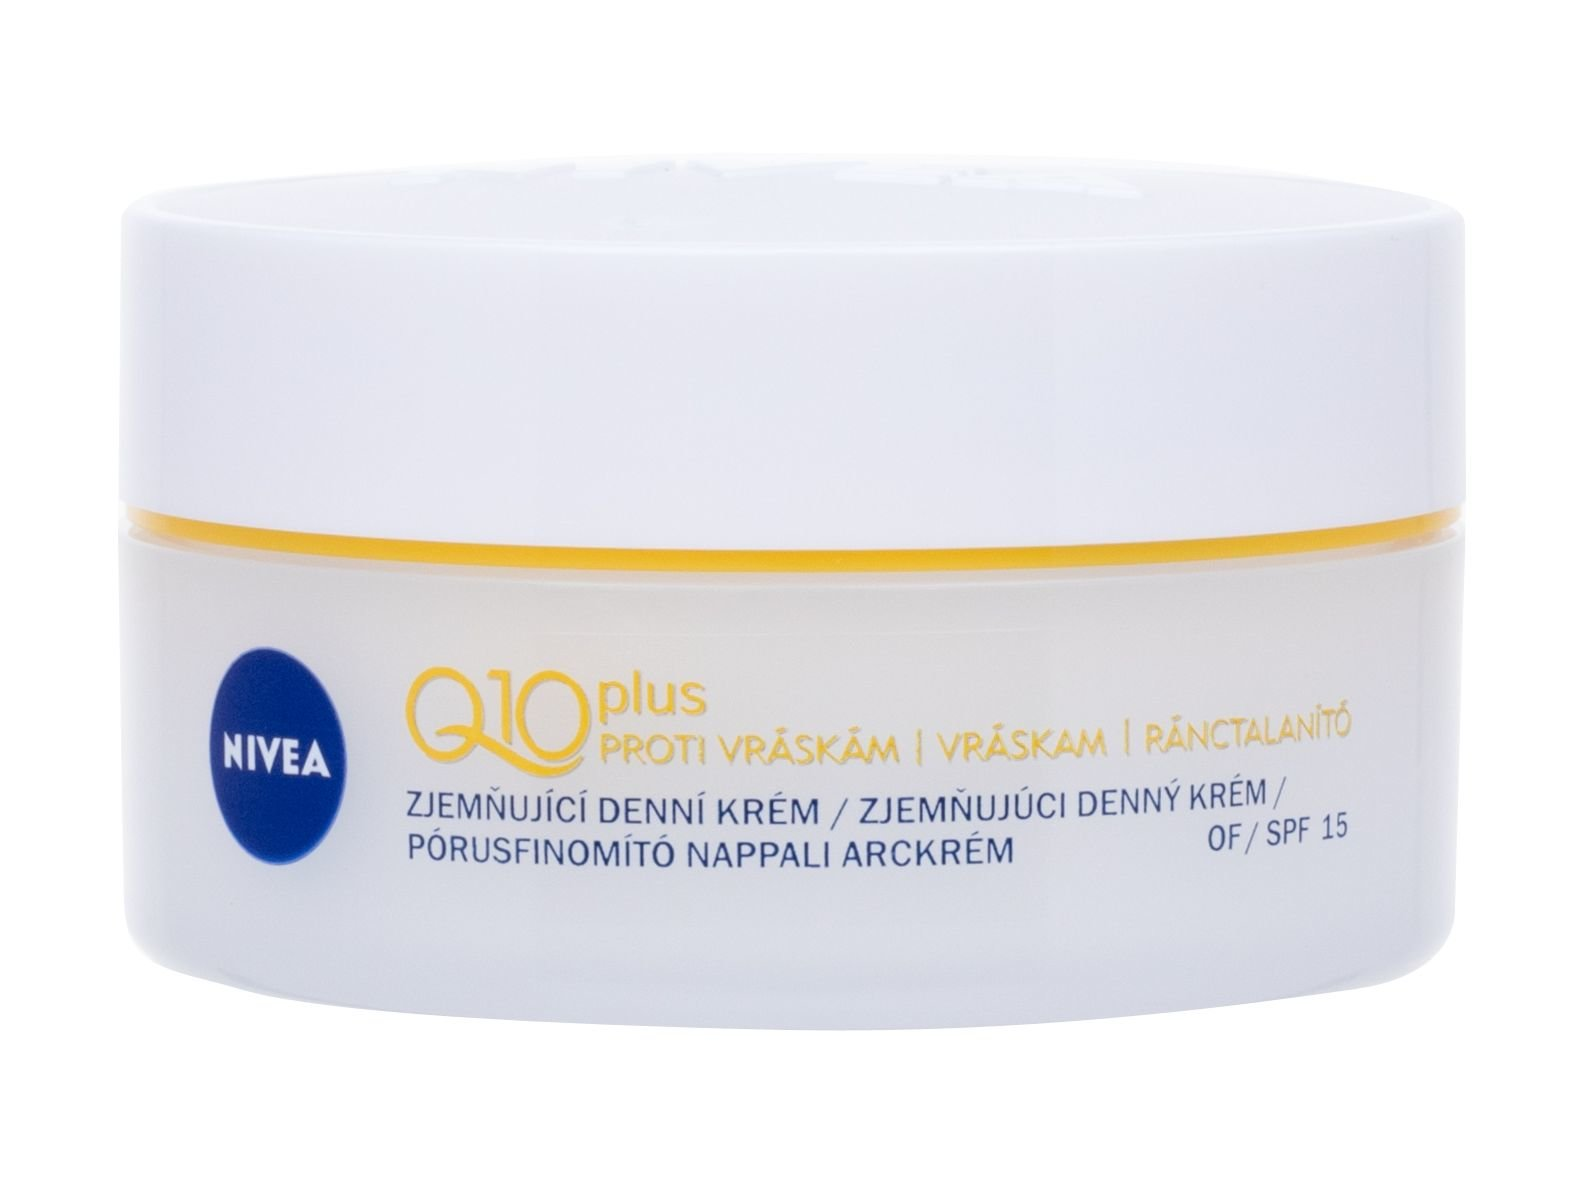 Nivea Q10 Plus Cosmetic 50ml